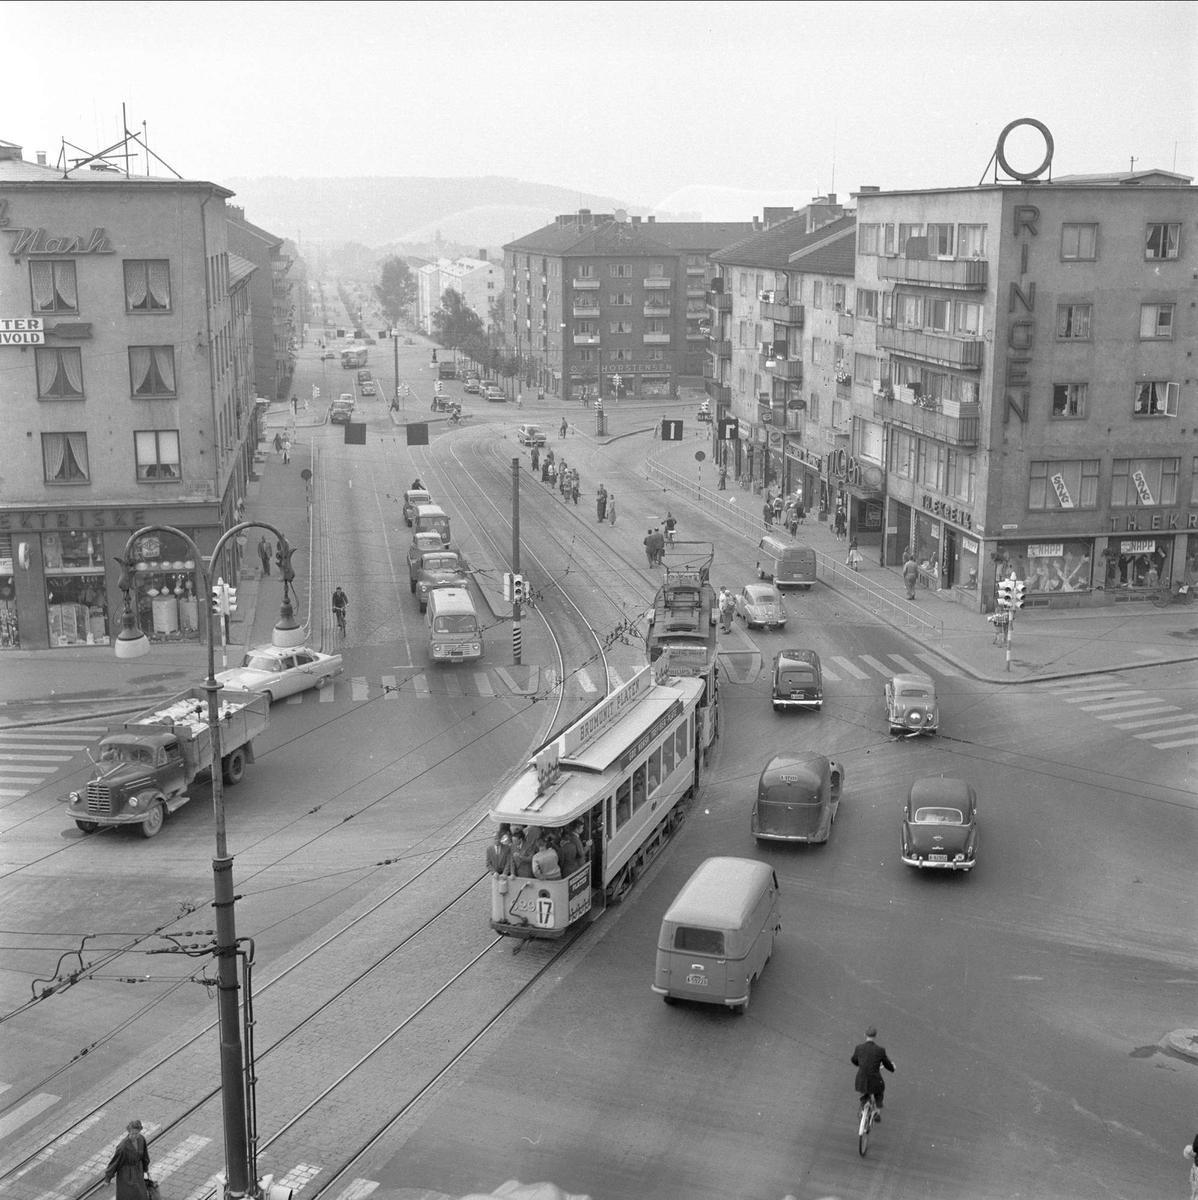 Trondheimsveien, Carl Berner, Oslo, 28.08.1958. Trafikk og bebyggelse.